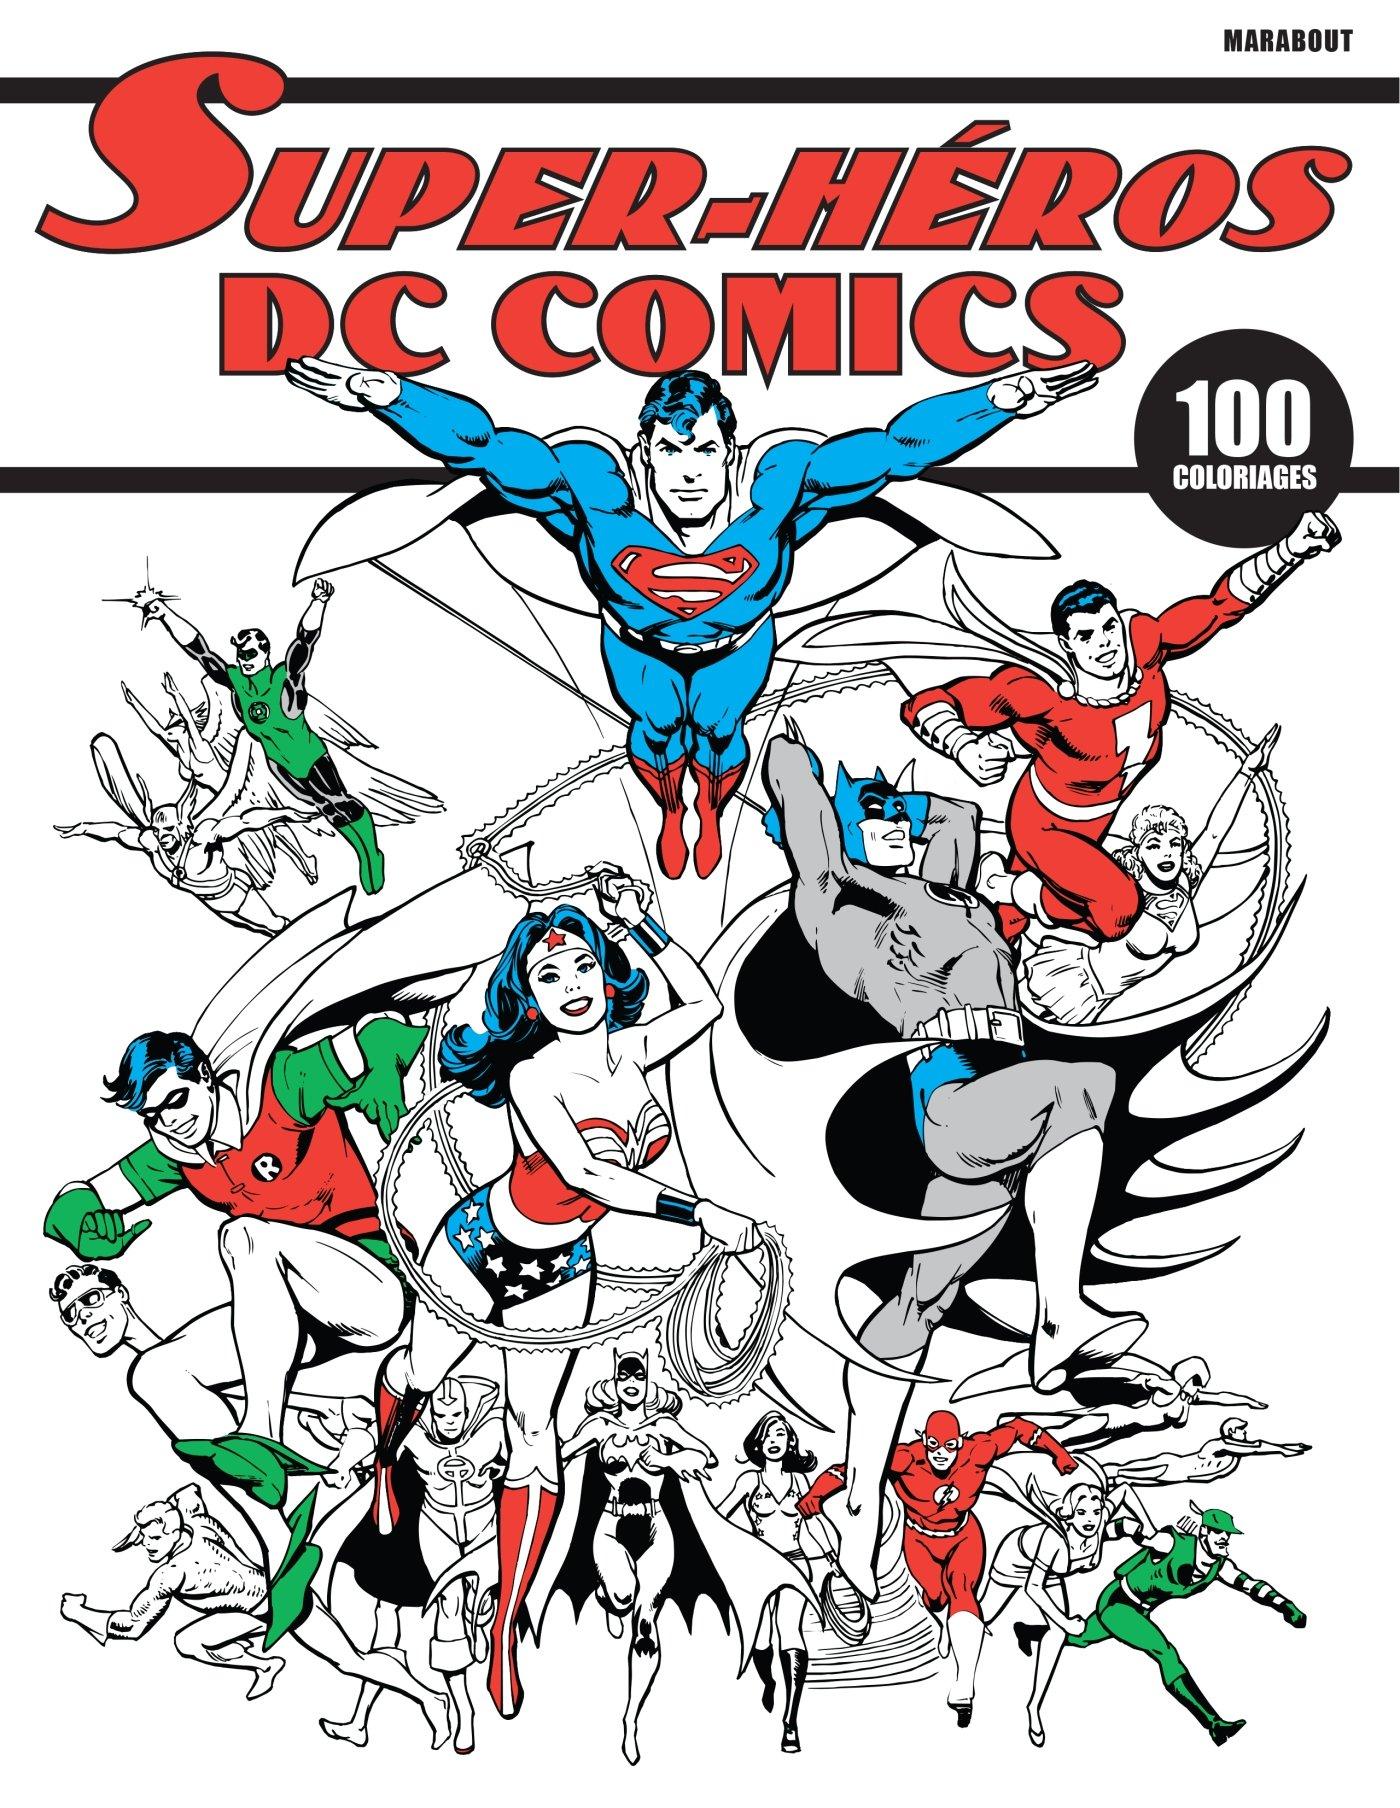 Carnet De Coloriage Super Heros Dc Comics Amazon Fr Collectif Livres